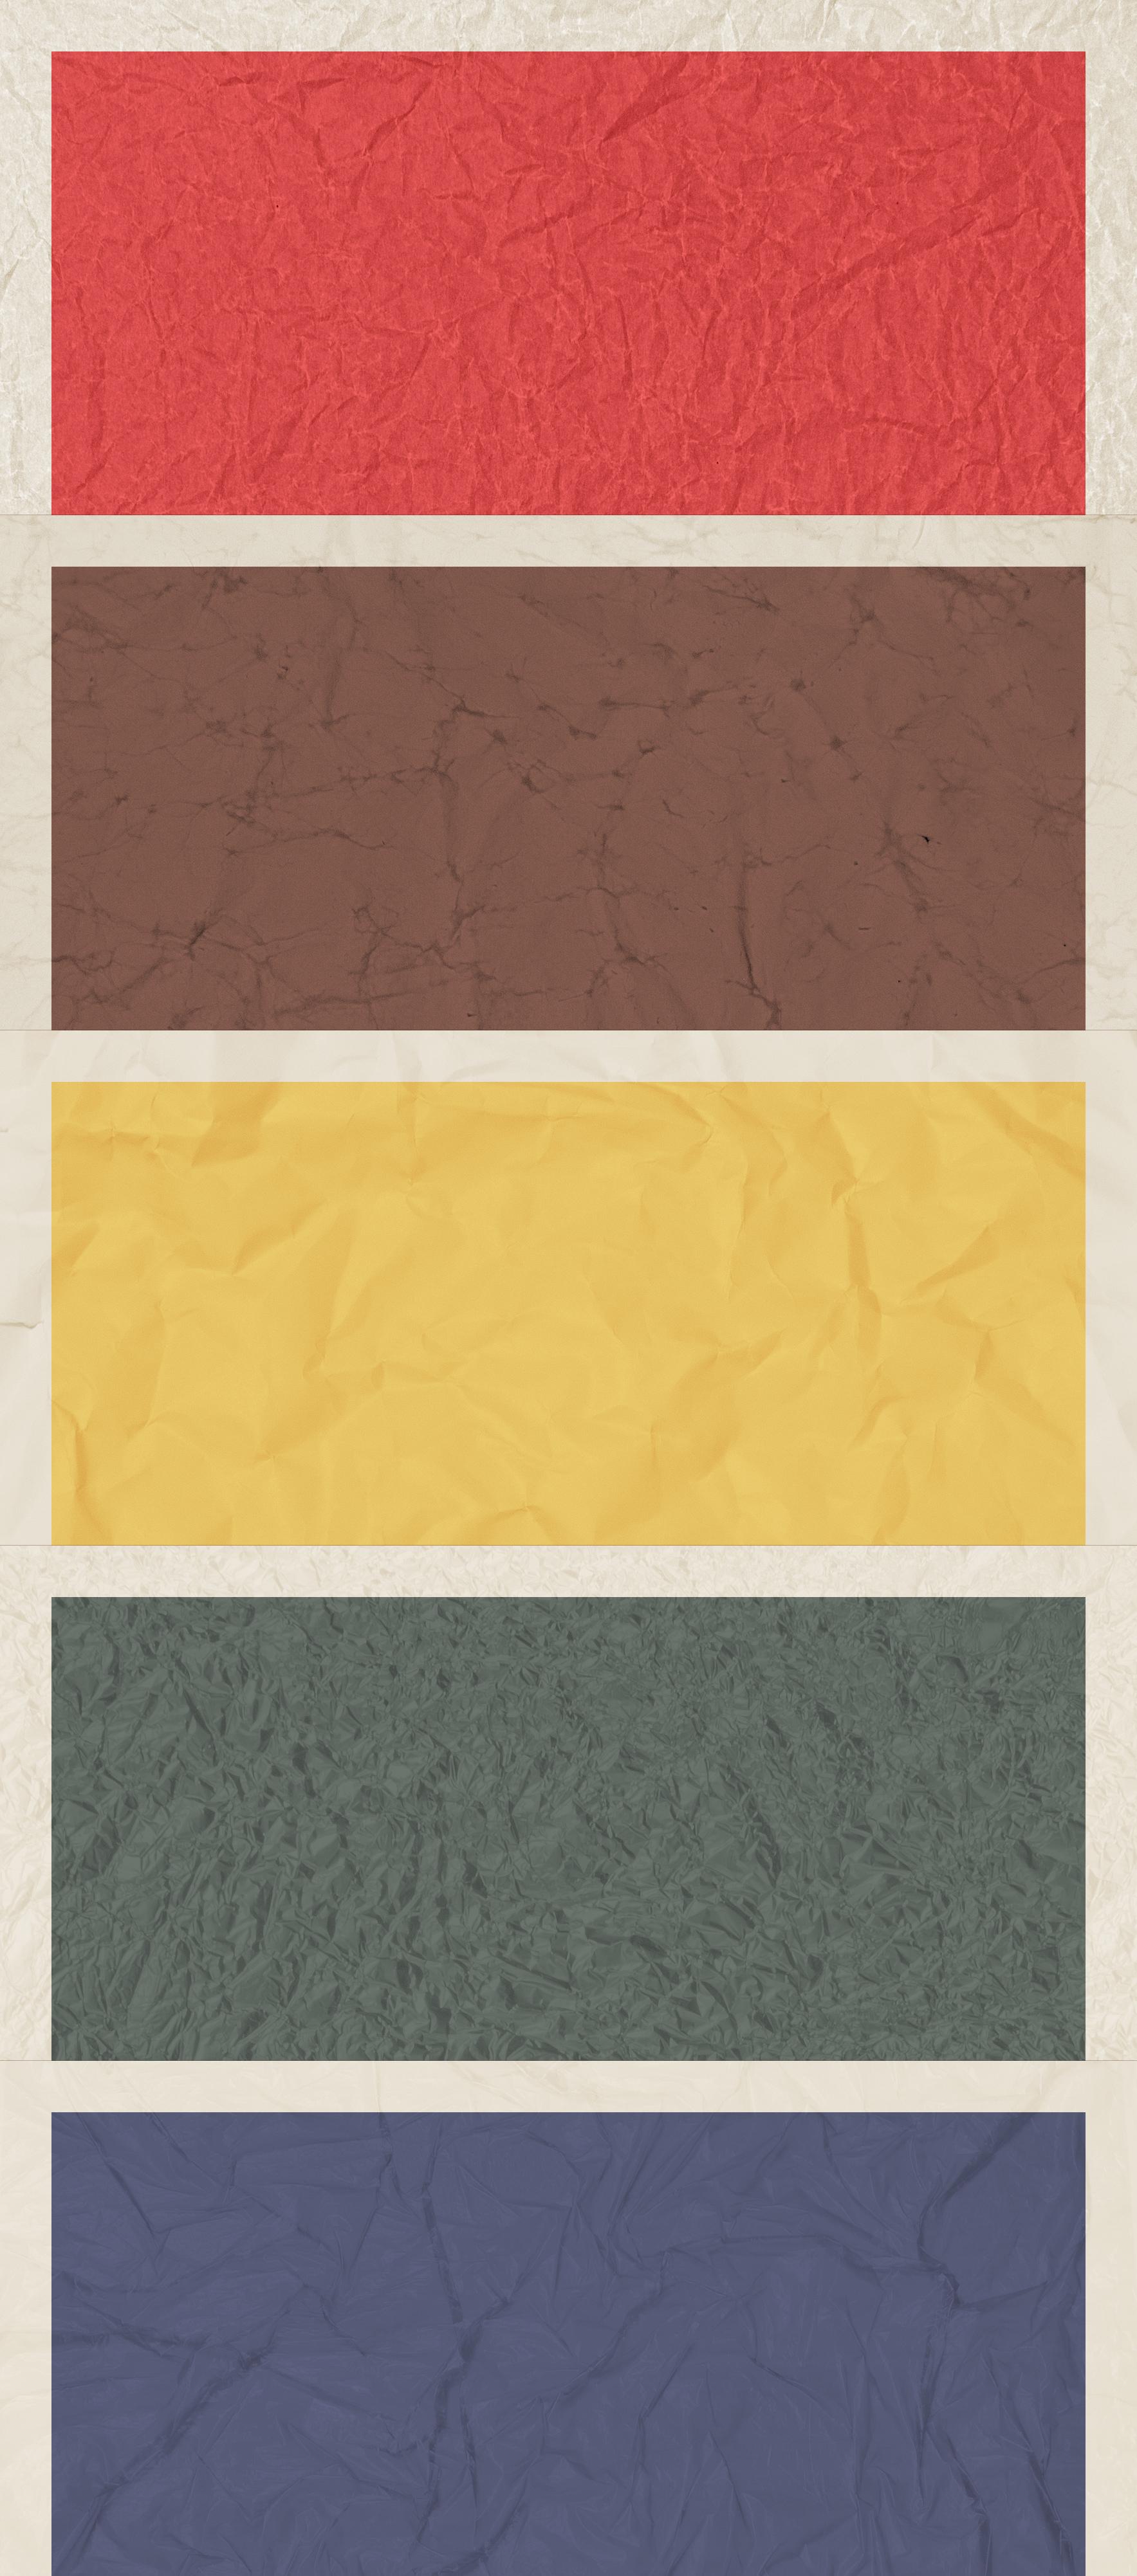 5 wrinkled poster backgrounds